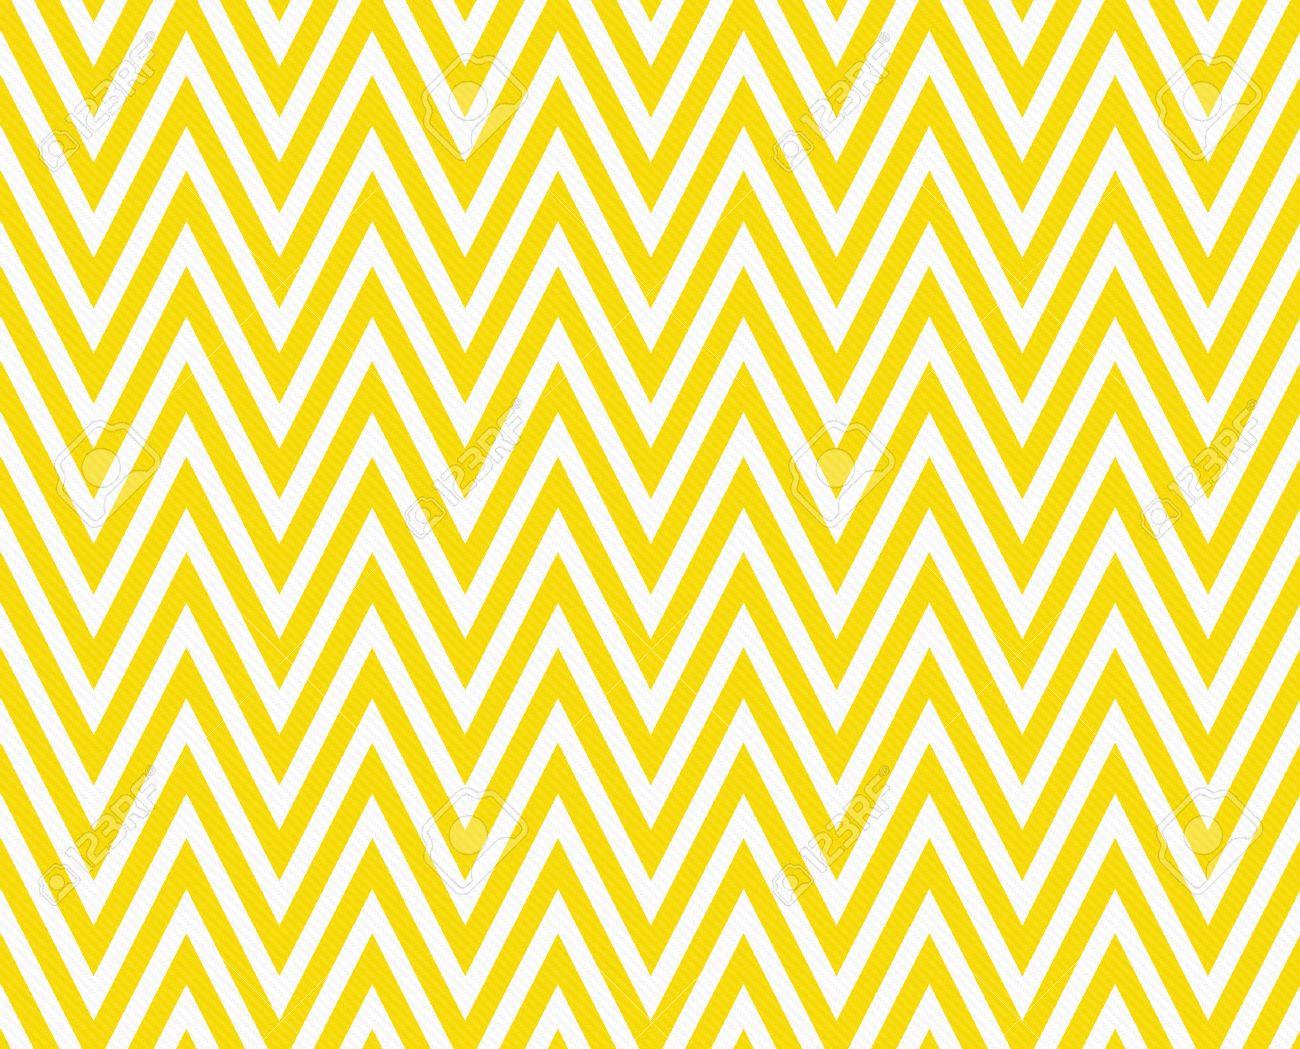 Thin Bright Yellow And White Horizontal Chevron Striped Textured ...